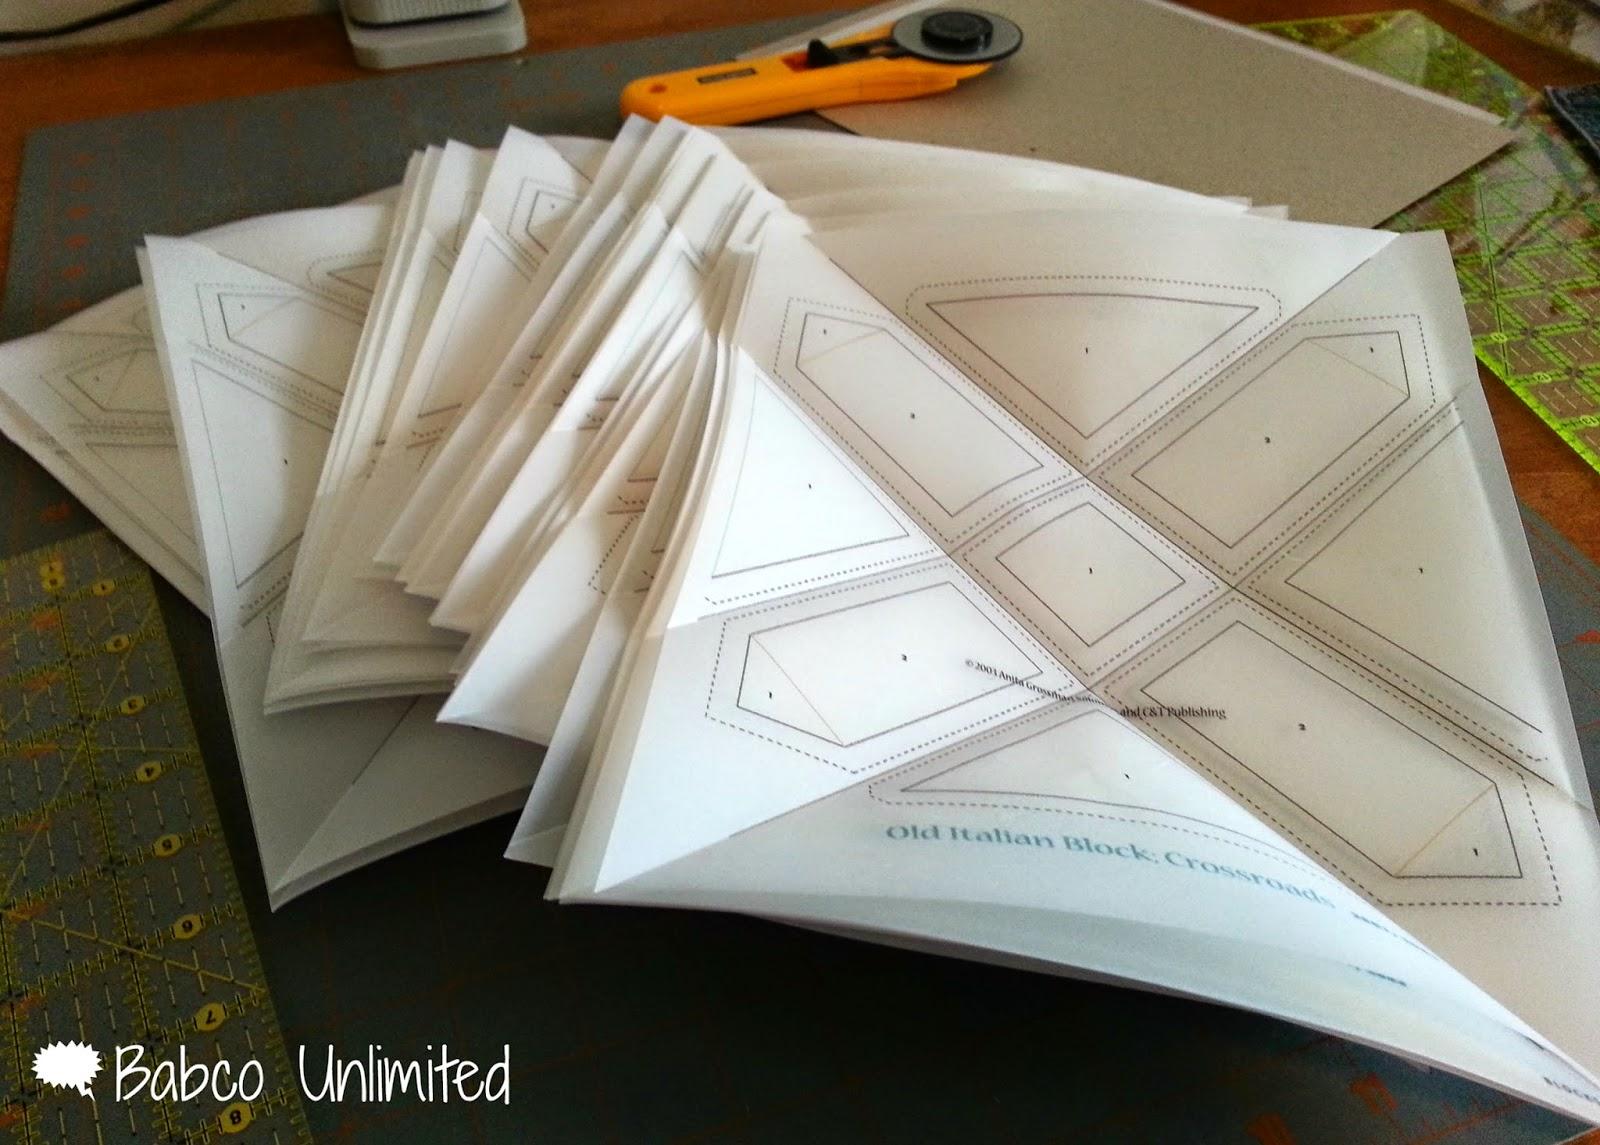 BabcoUnlimited.blogspot.com - Old Italian Quilt Vellum Paper